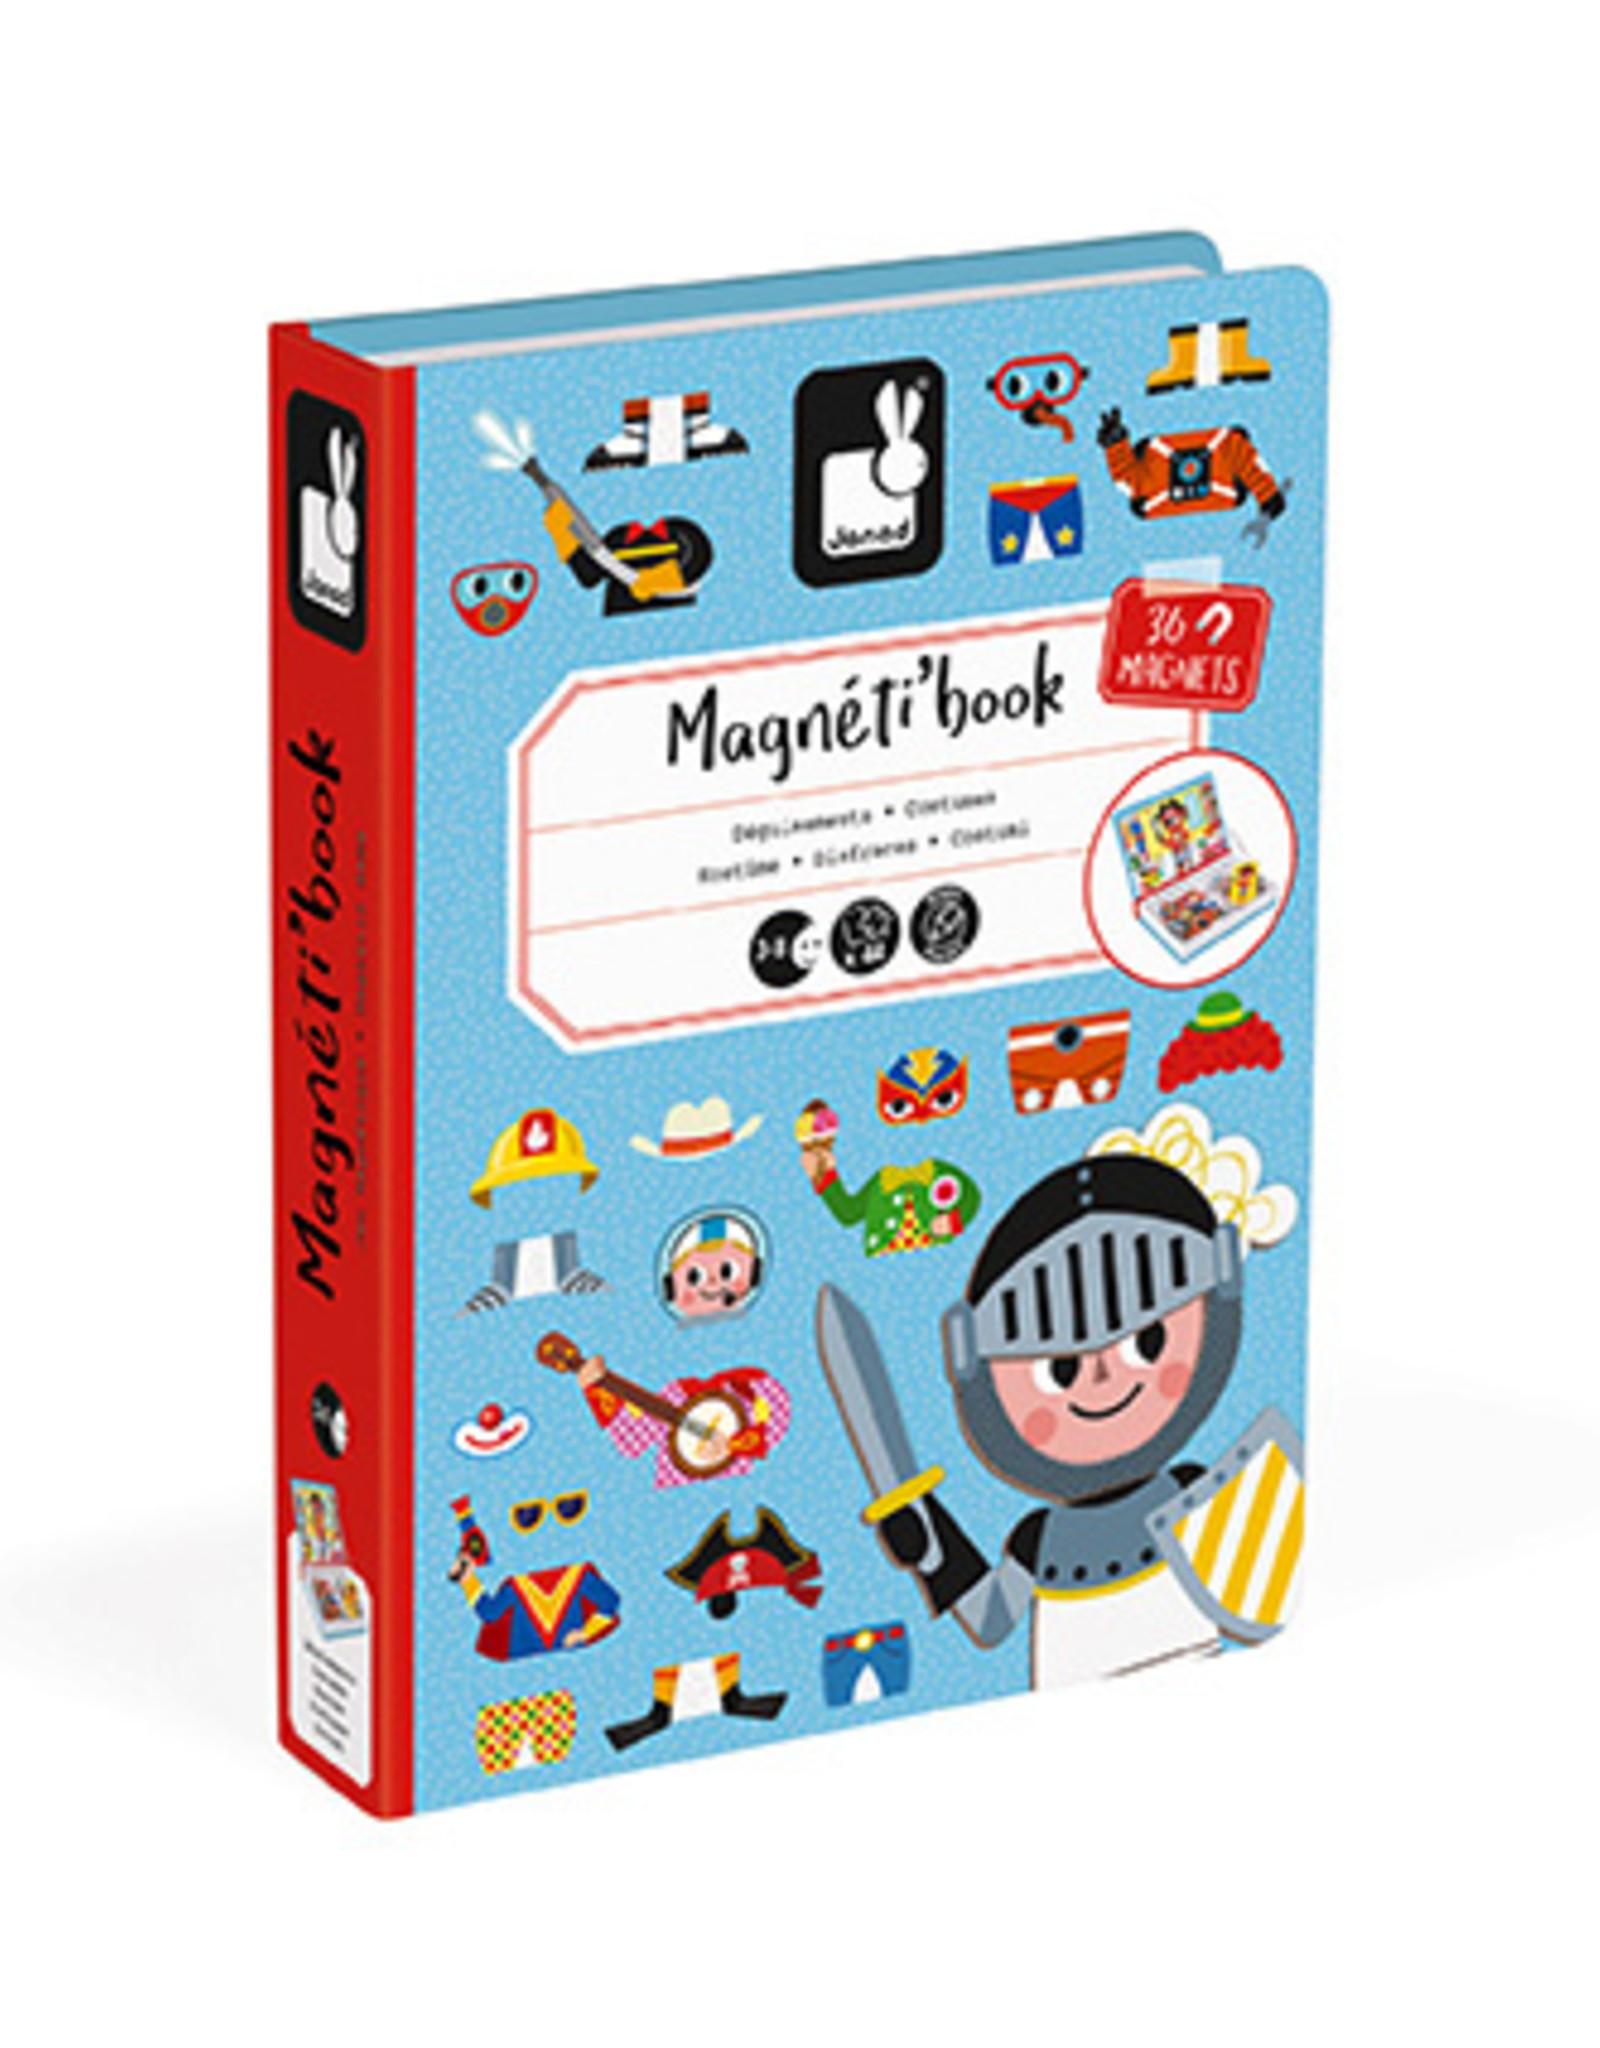 Boys' Costumes Magneti' Book